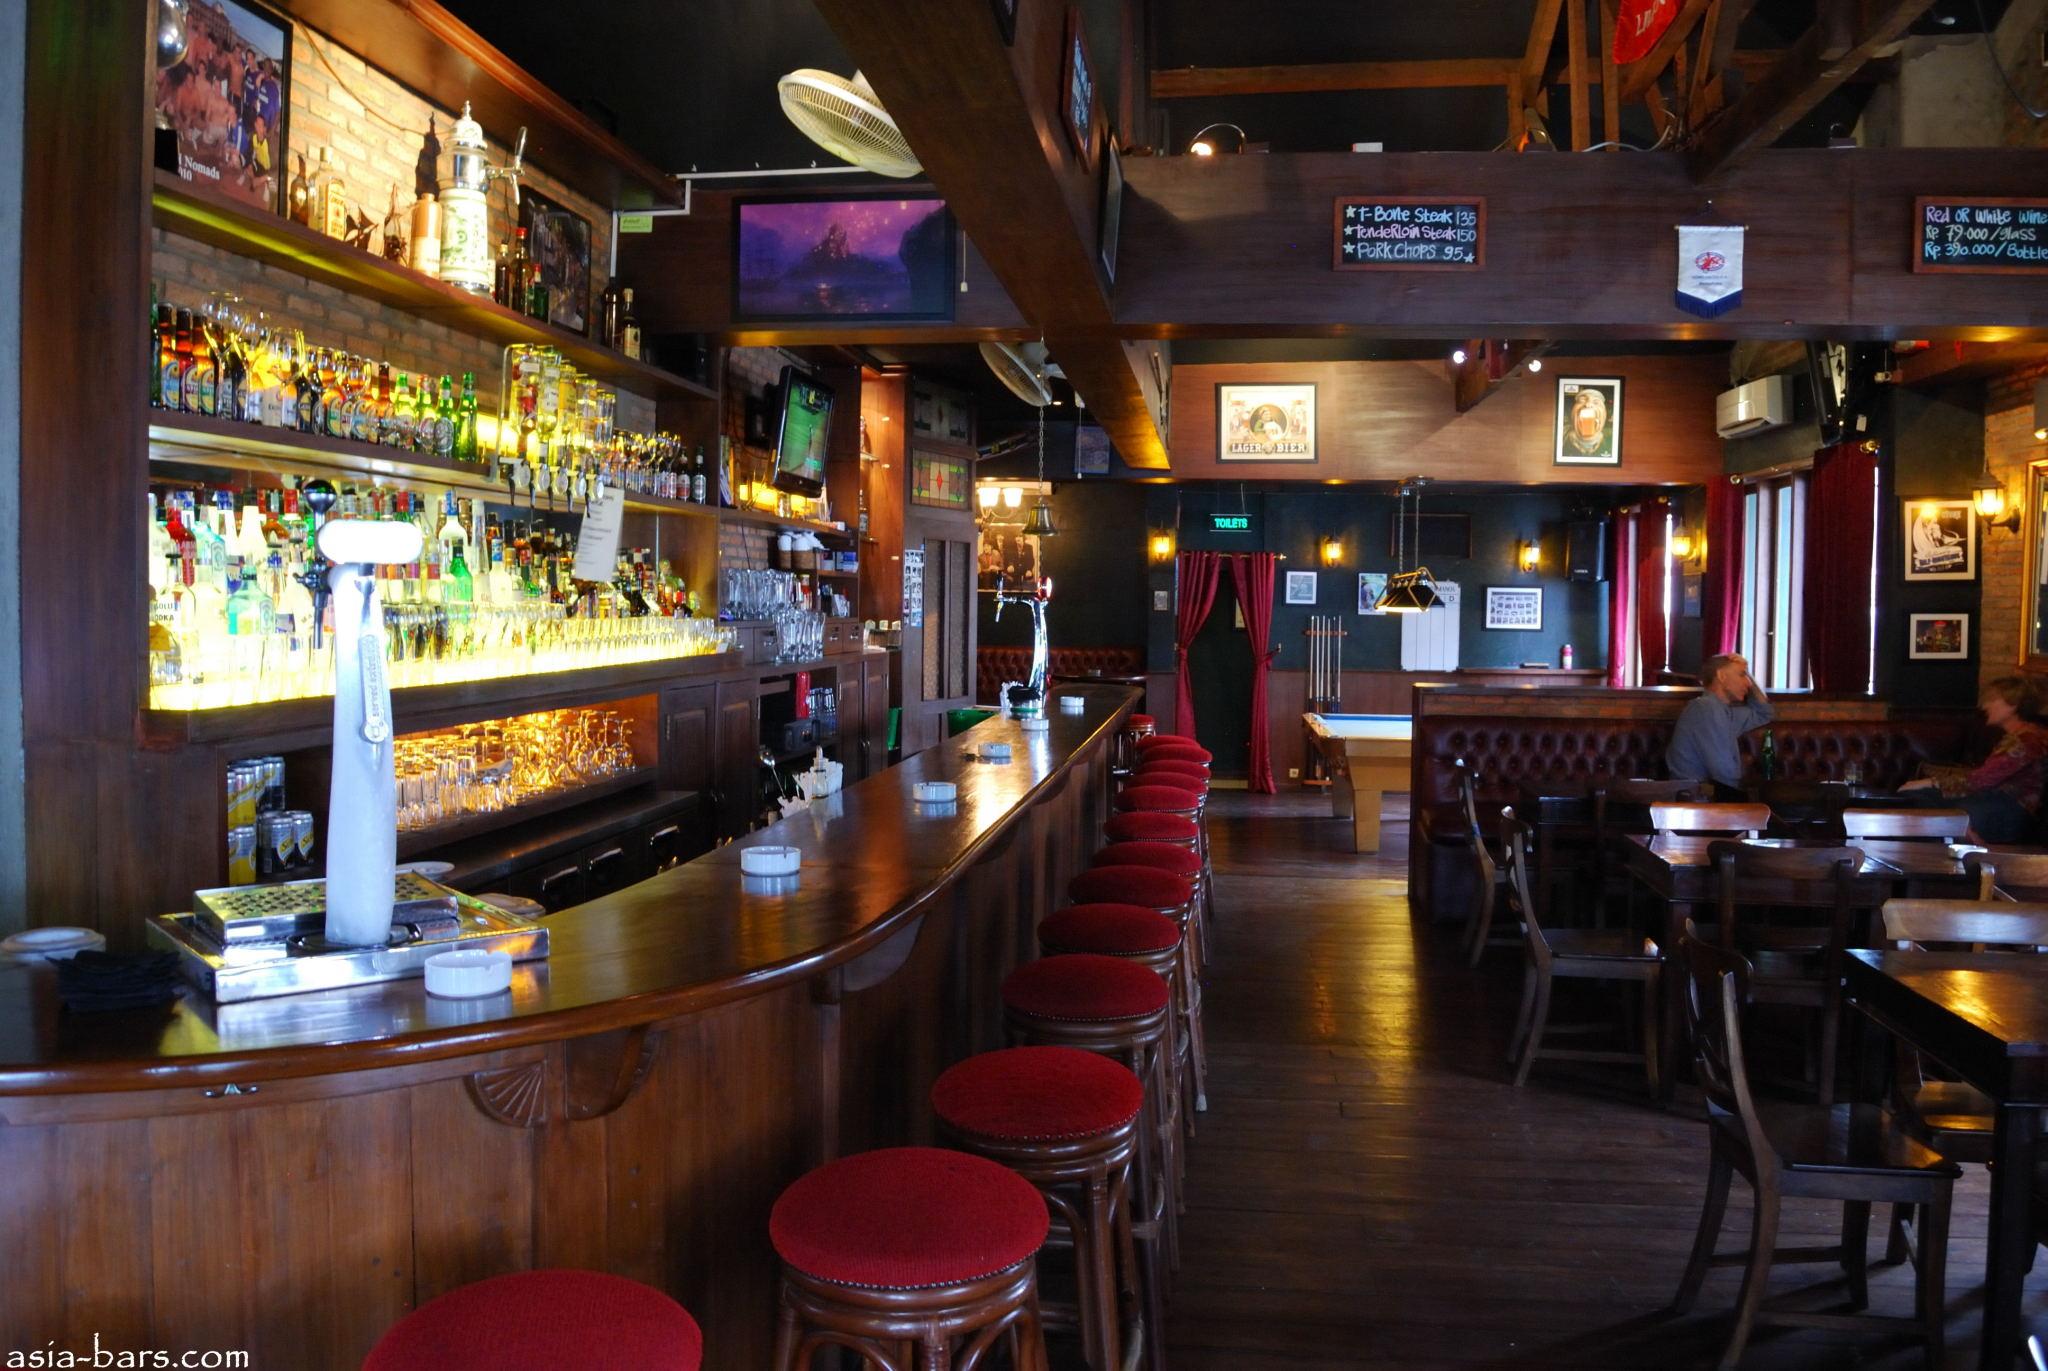 De Hooi Pub Sports Bar Night Club A Venue With A Real